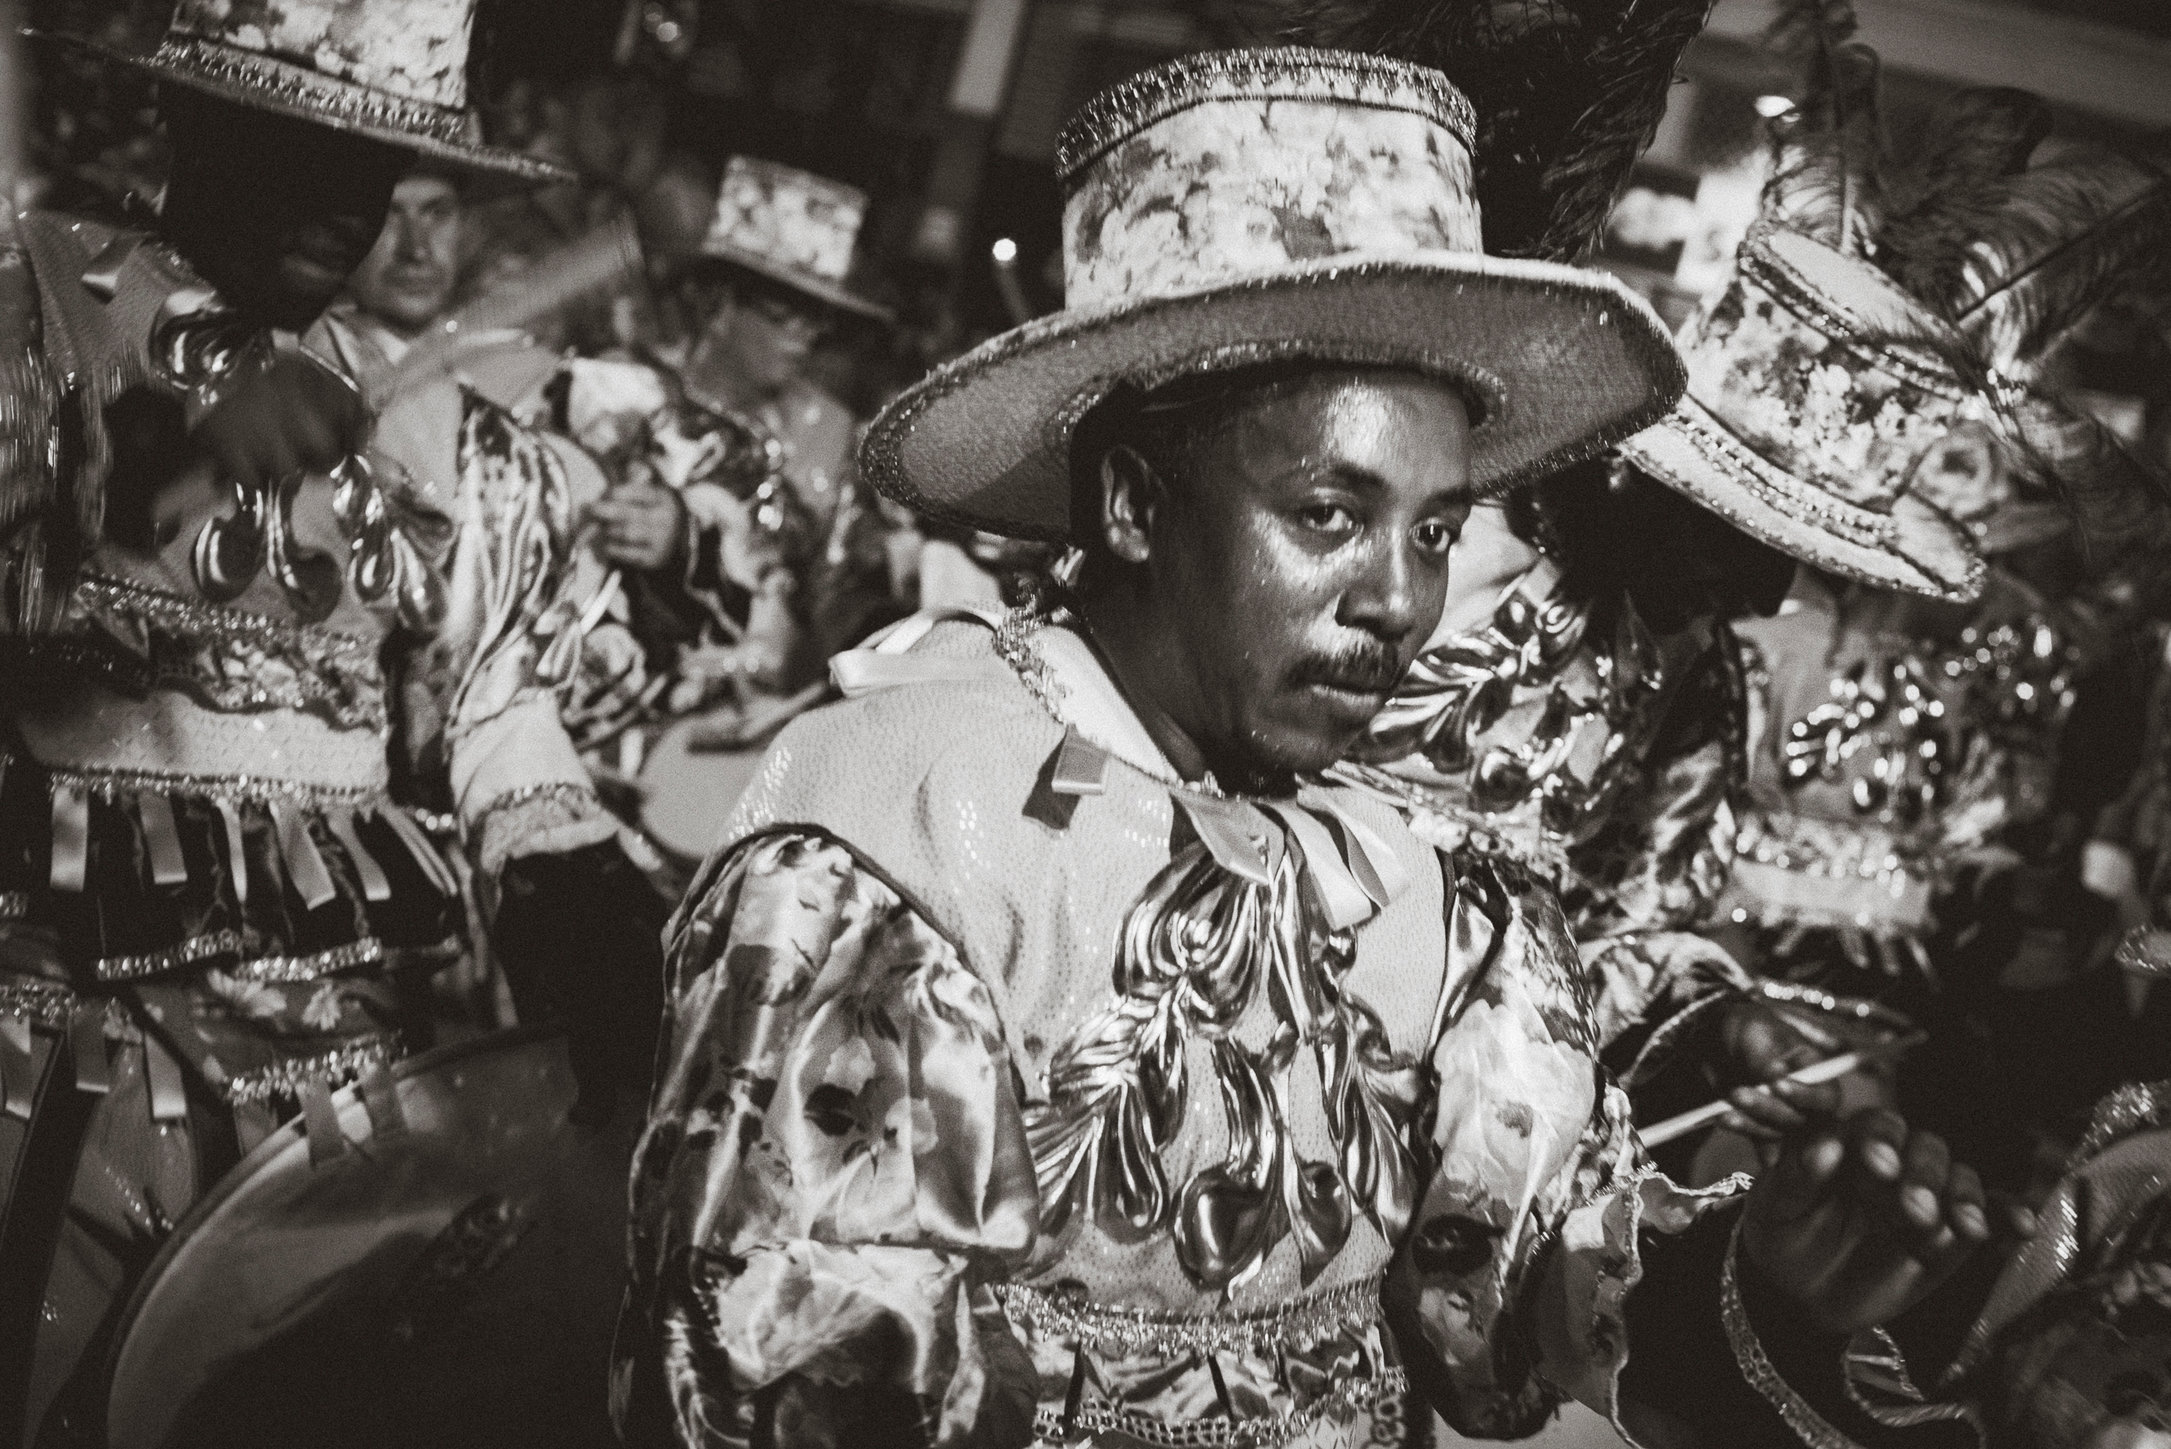 20180211-Carnaval-124.jpg